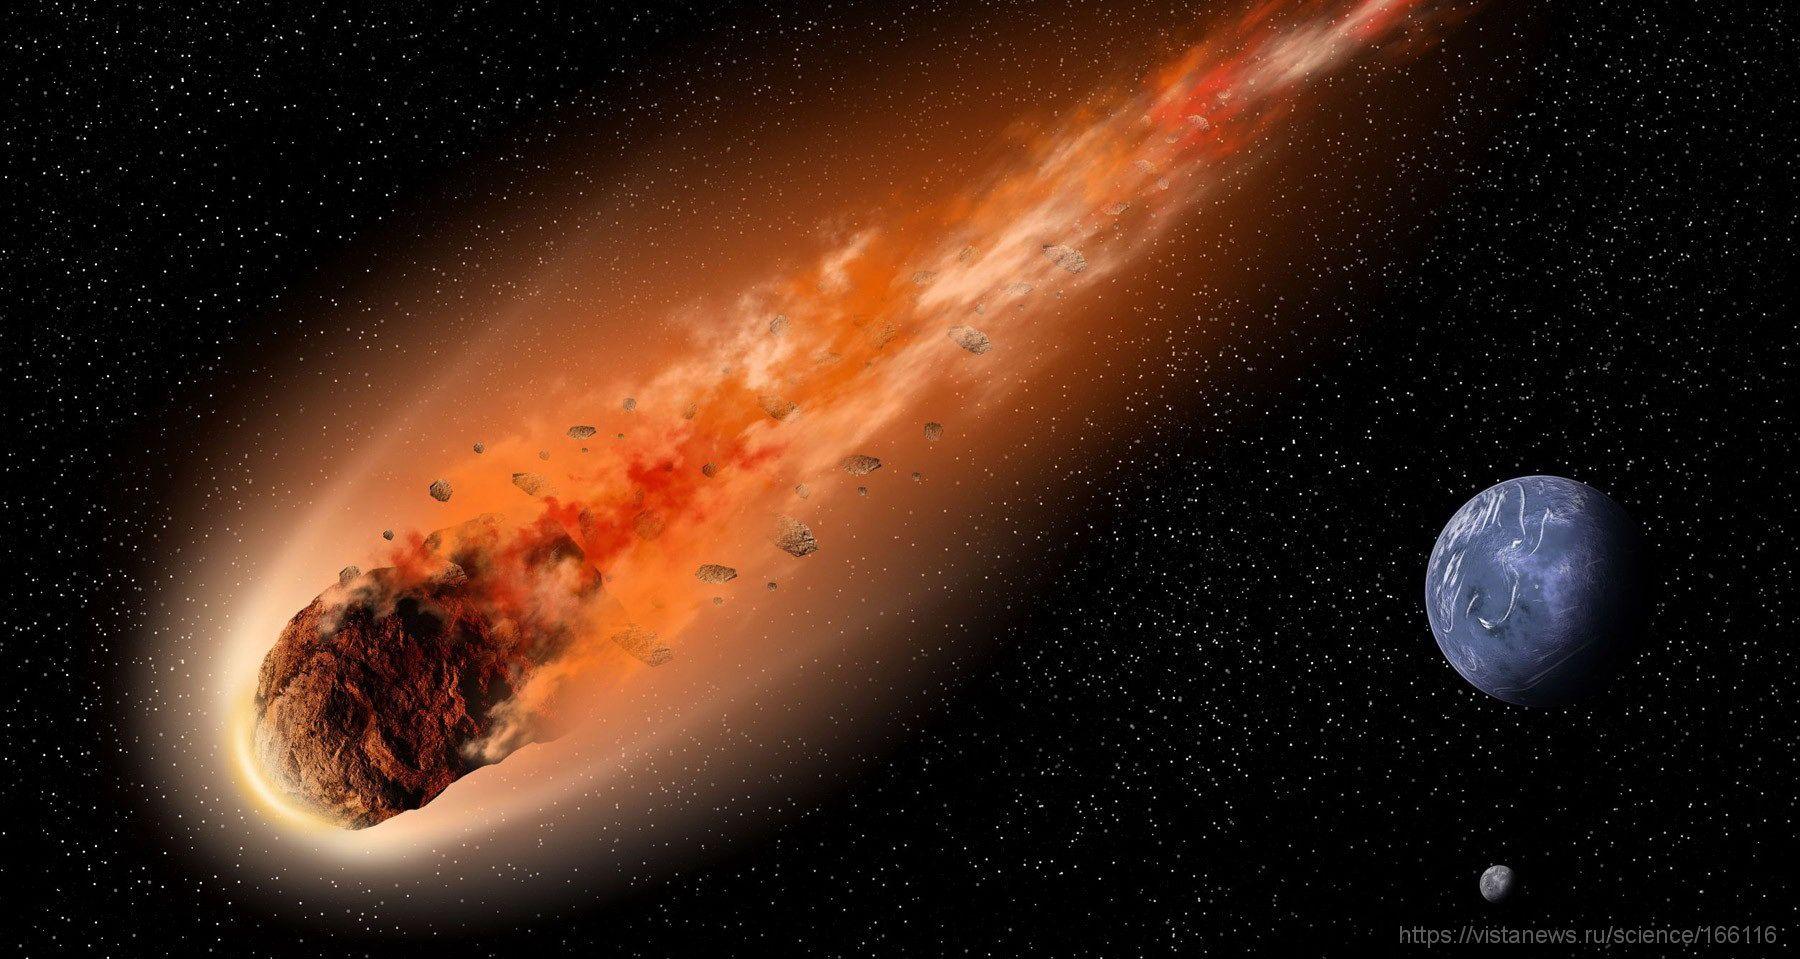 1502789169_1500993885_asteroid-letit-mimo-zemli-video-908909.jpg